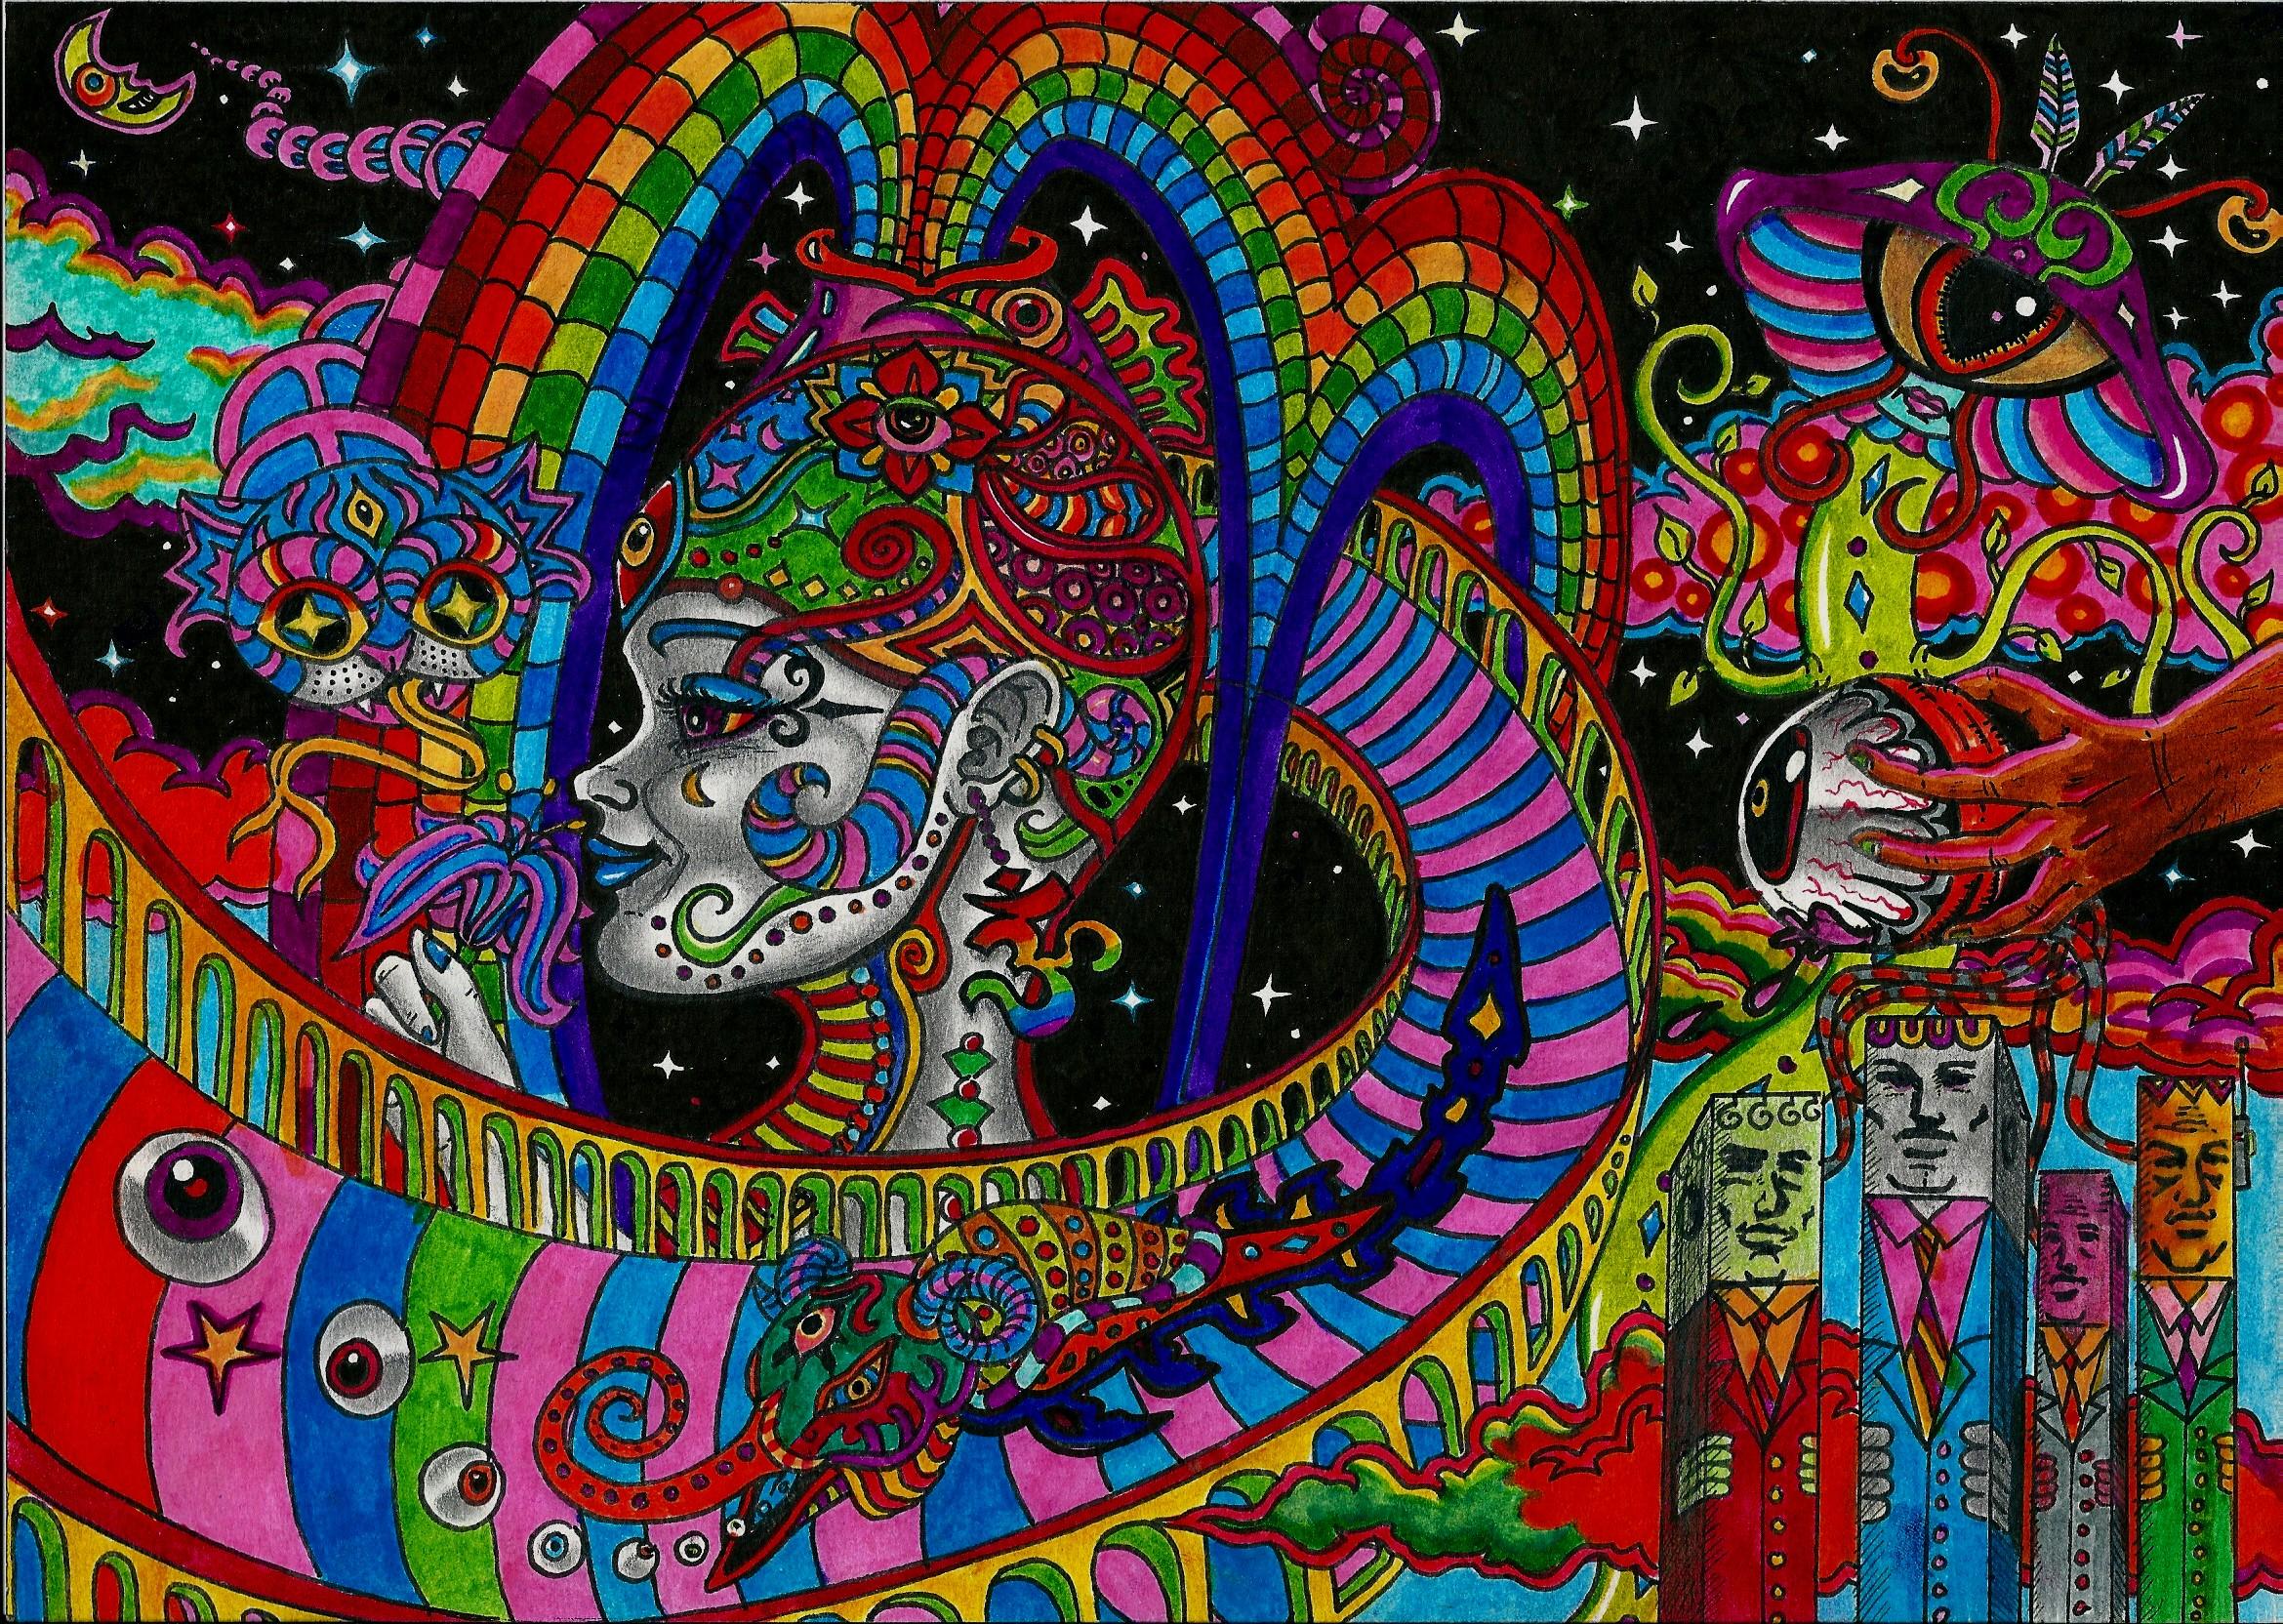 Psychedelic Art favourites by Jc-Sparkz on DeviantArt